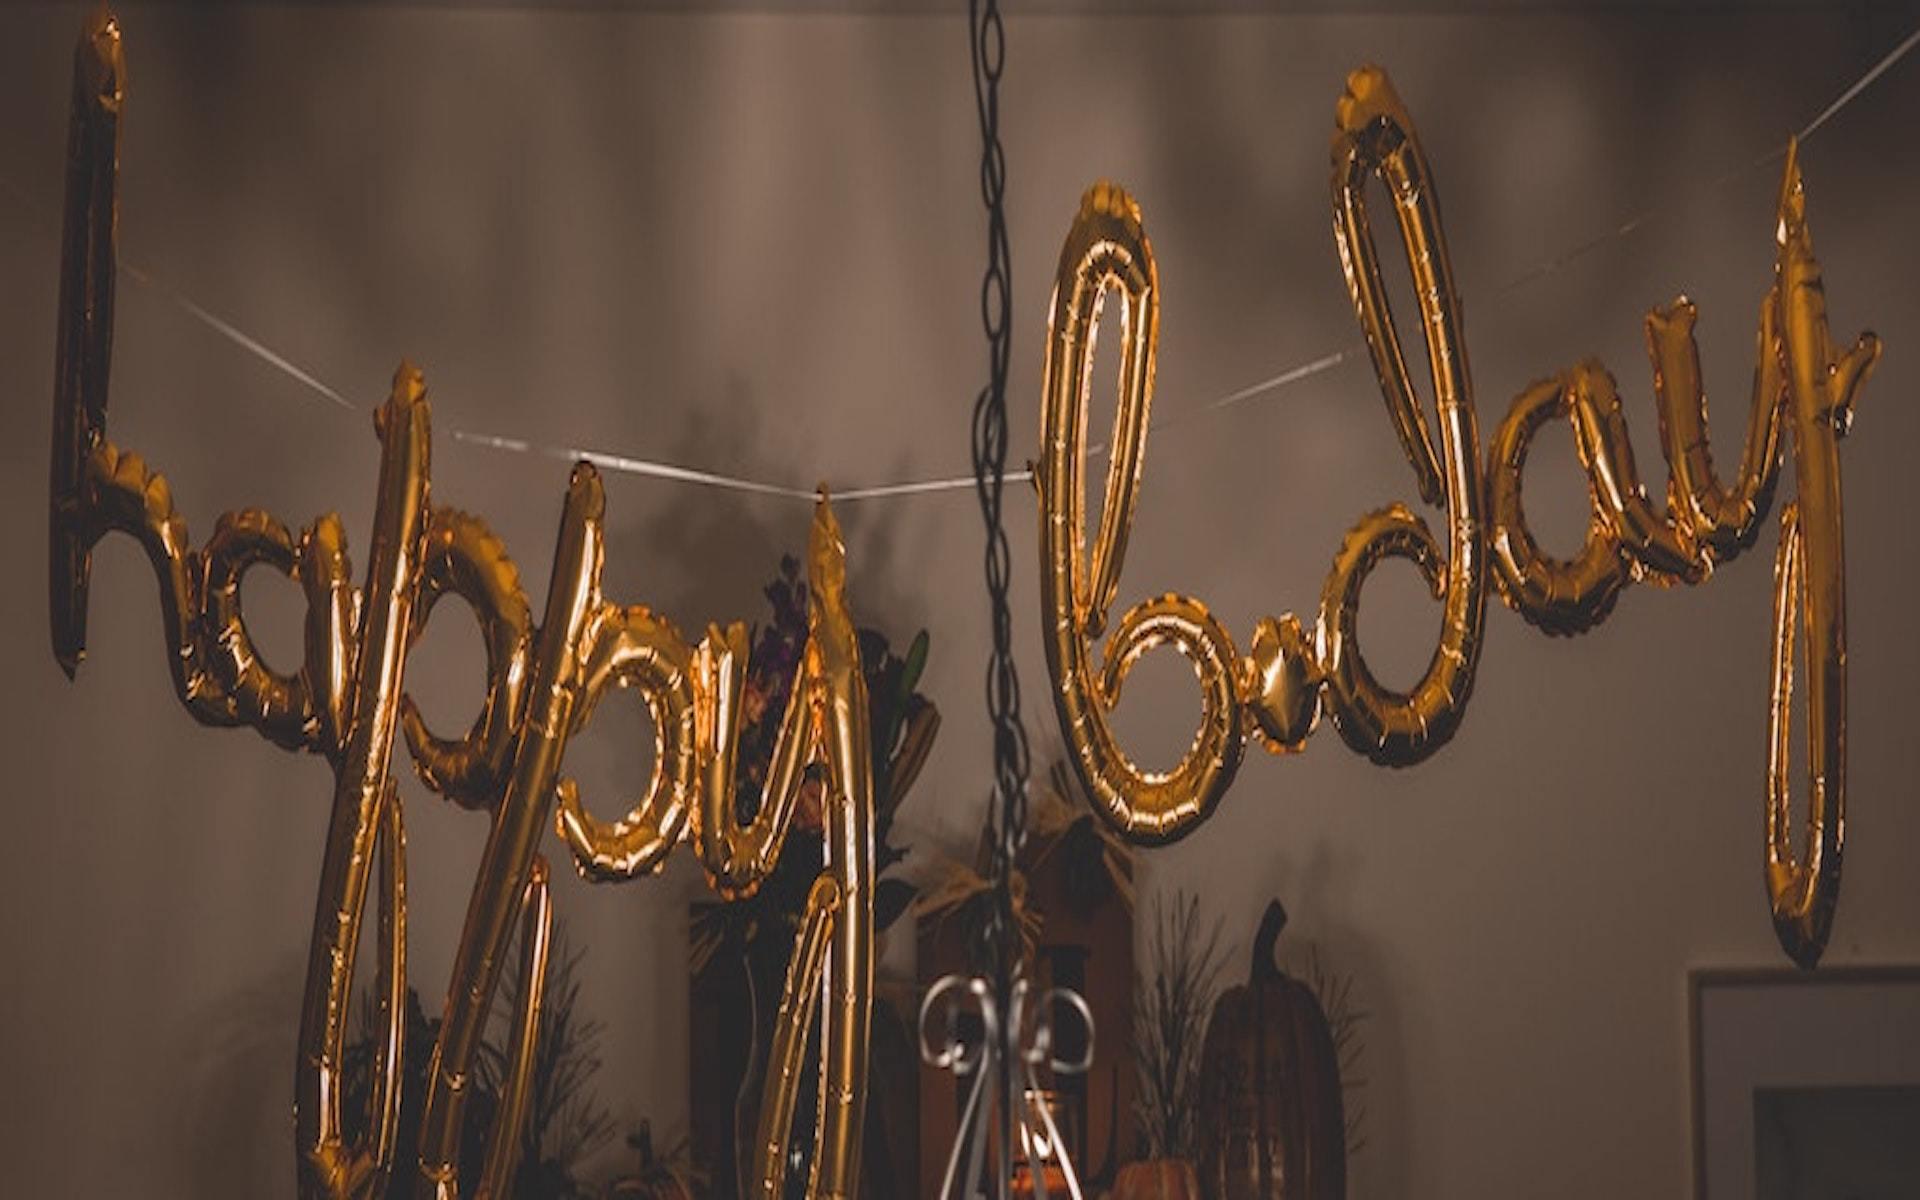 gold happy bday balloons